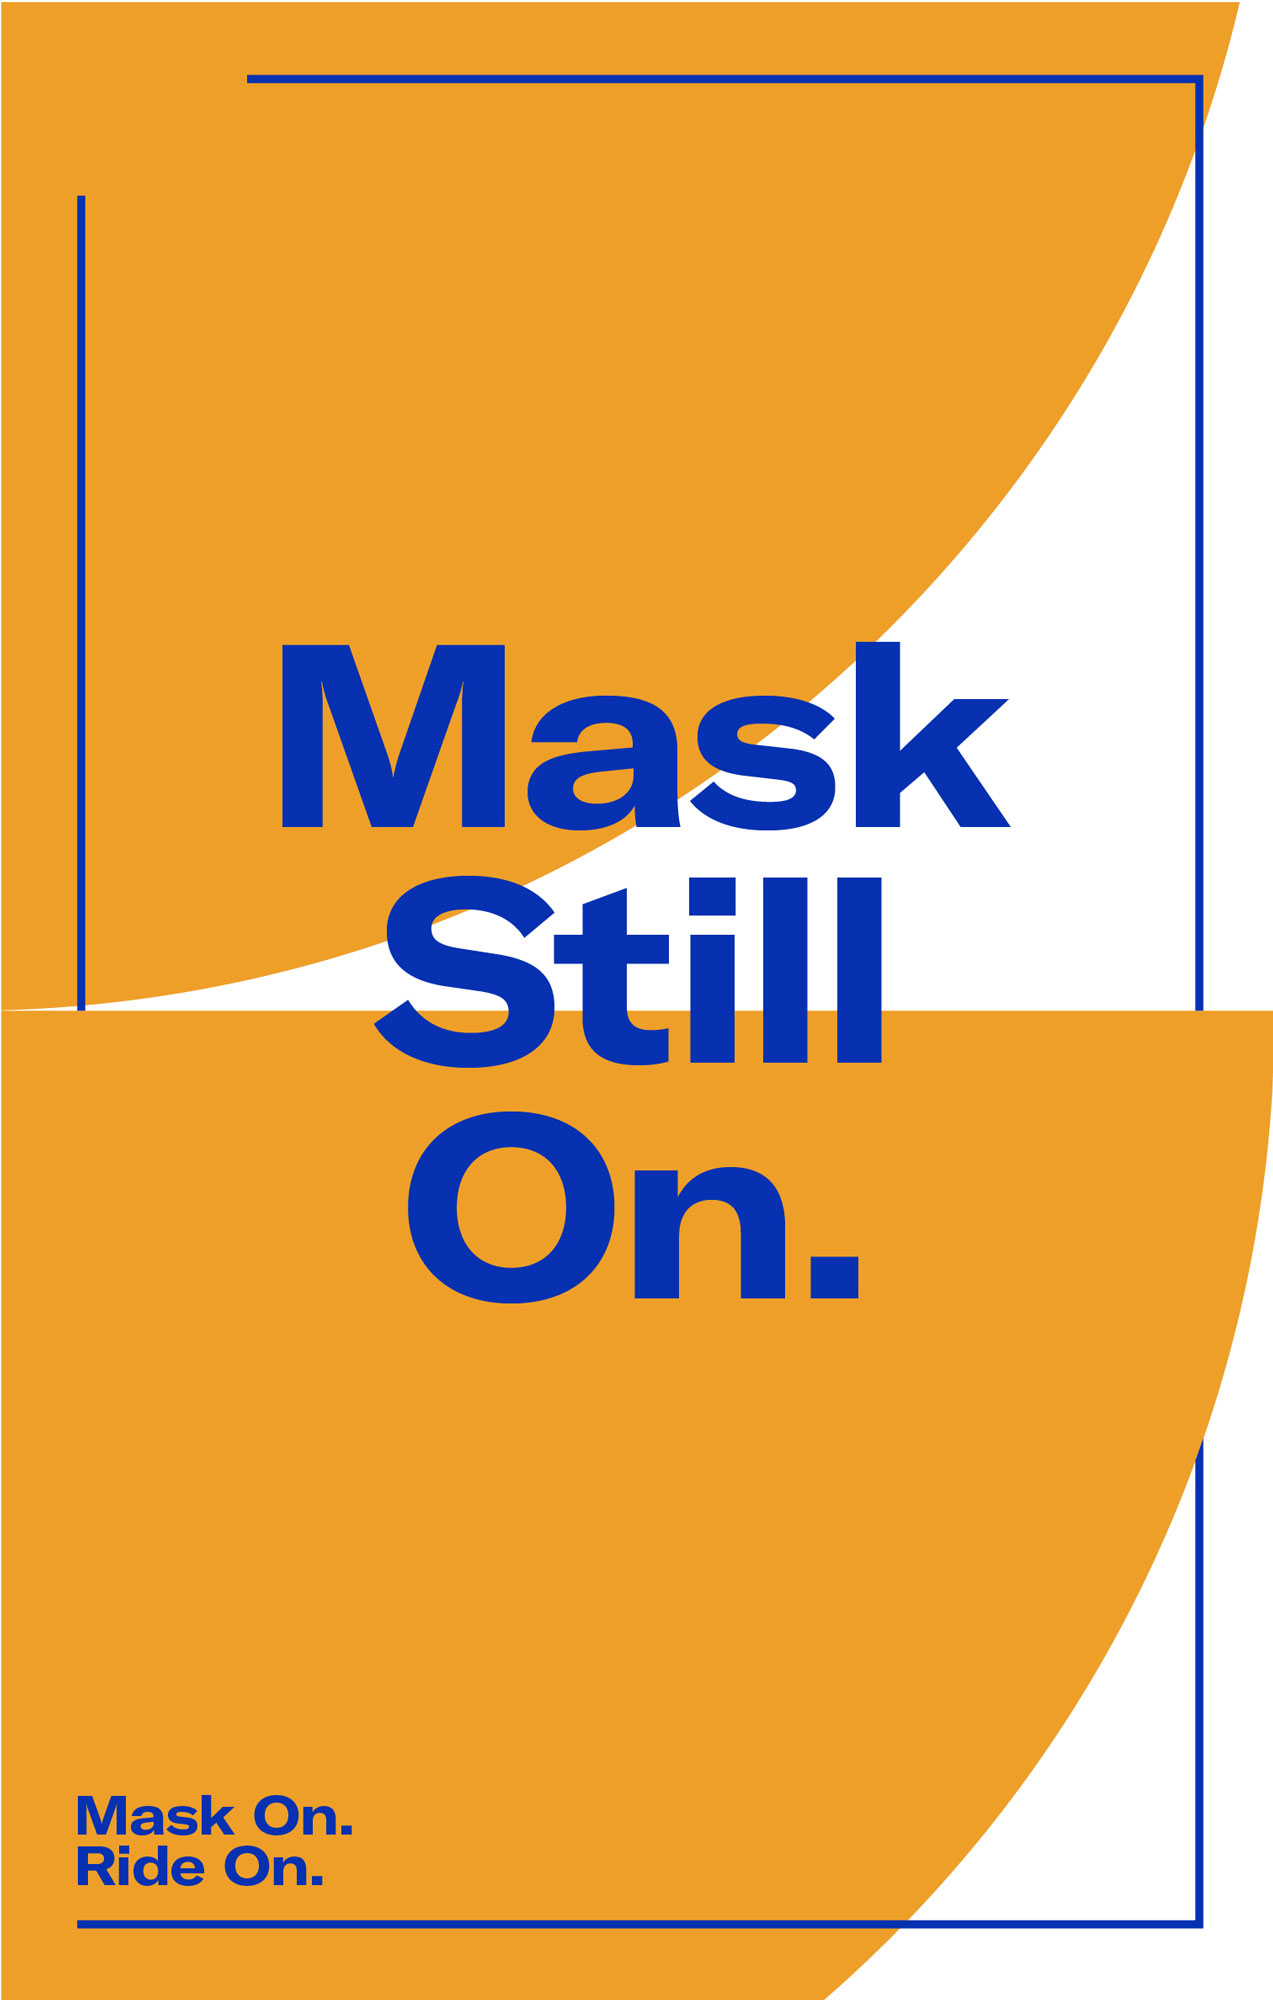 MaskStillOn-masked